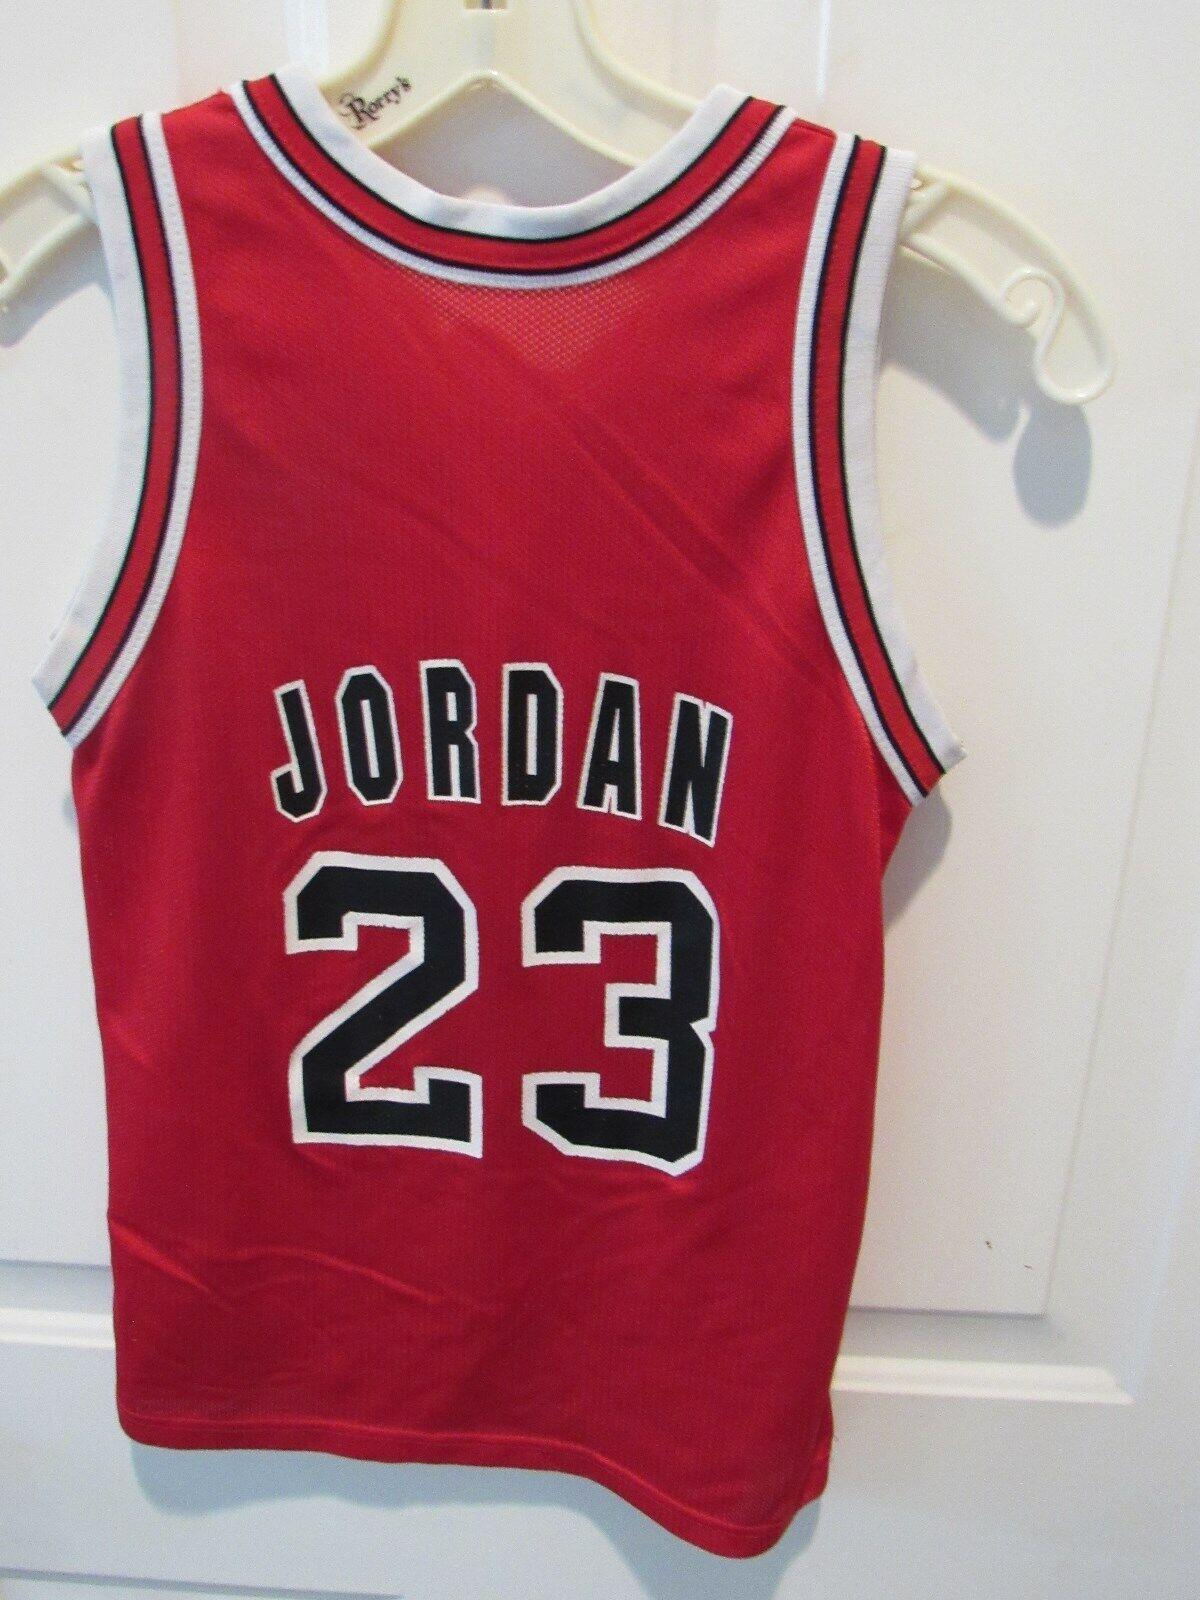 competitive price eb133 8633e VTG Michael Jordan Chicago Bulls Jersey boy's size medium 10-12 Champion  NBA 90s